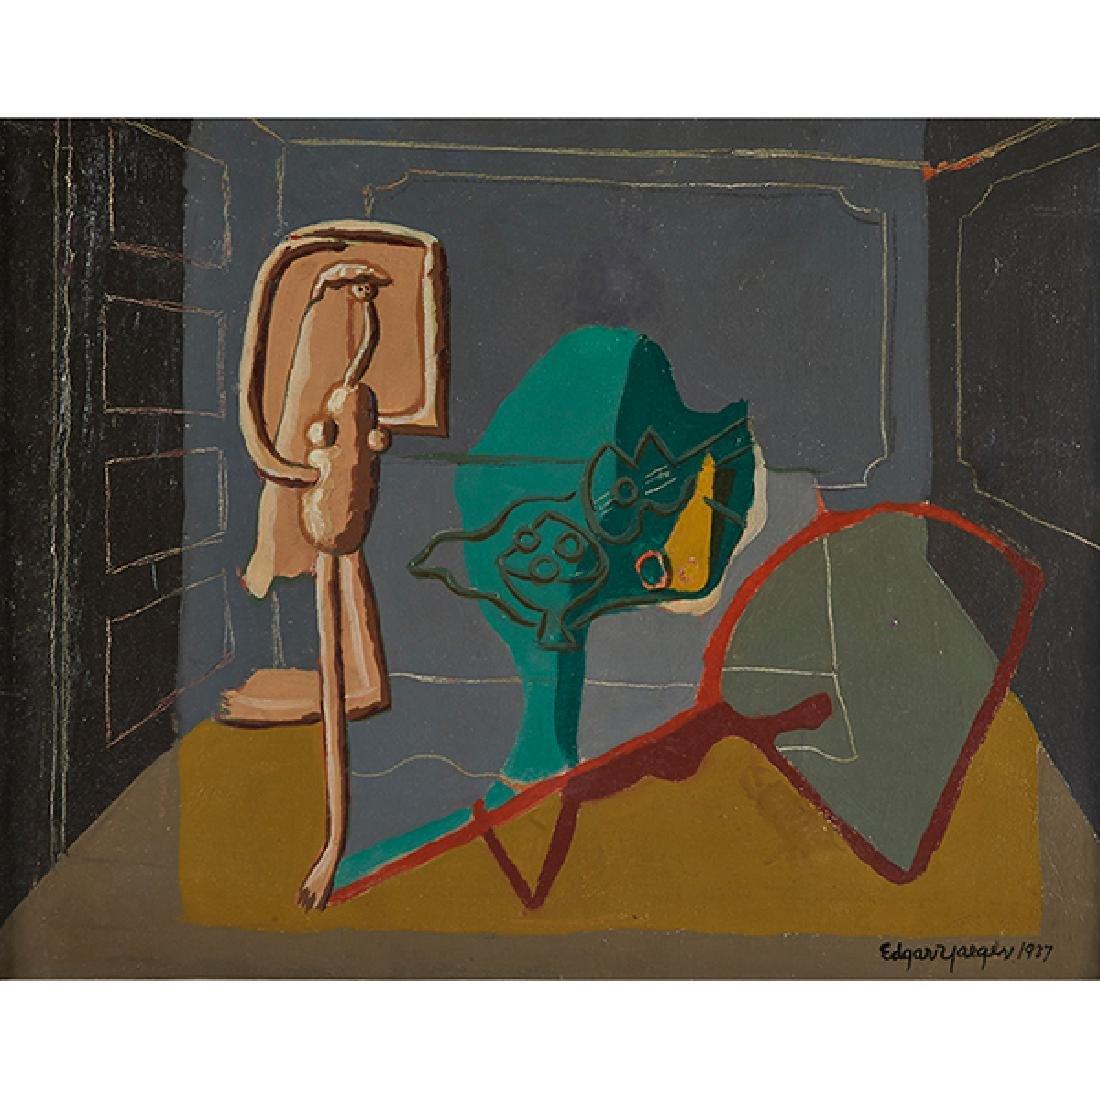 Edgar Yaeger, (American, 1904-1997), Abstraction Figure